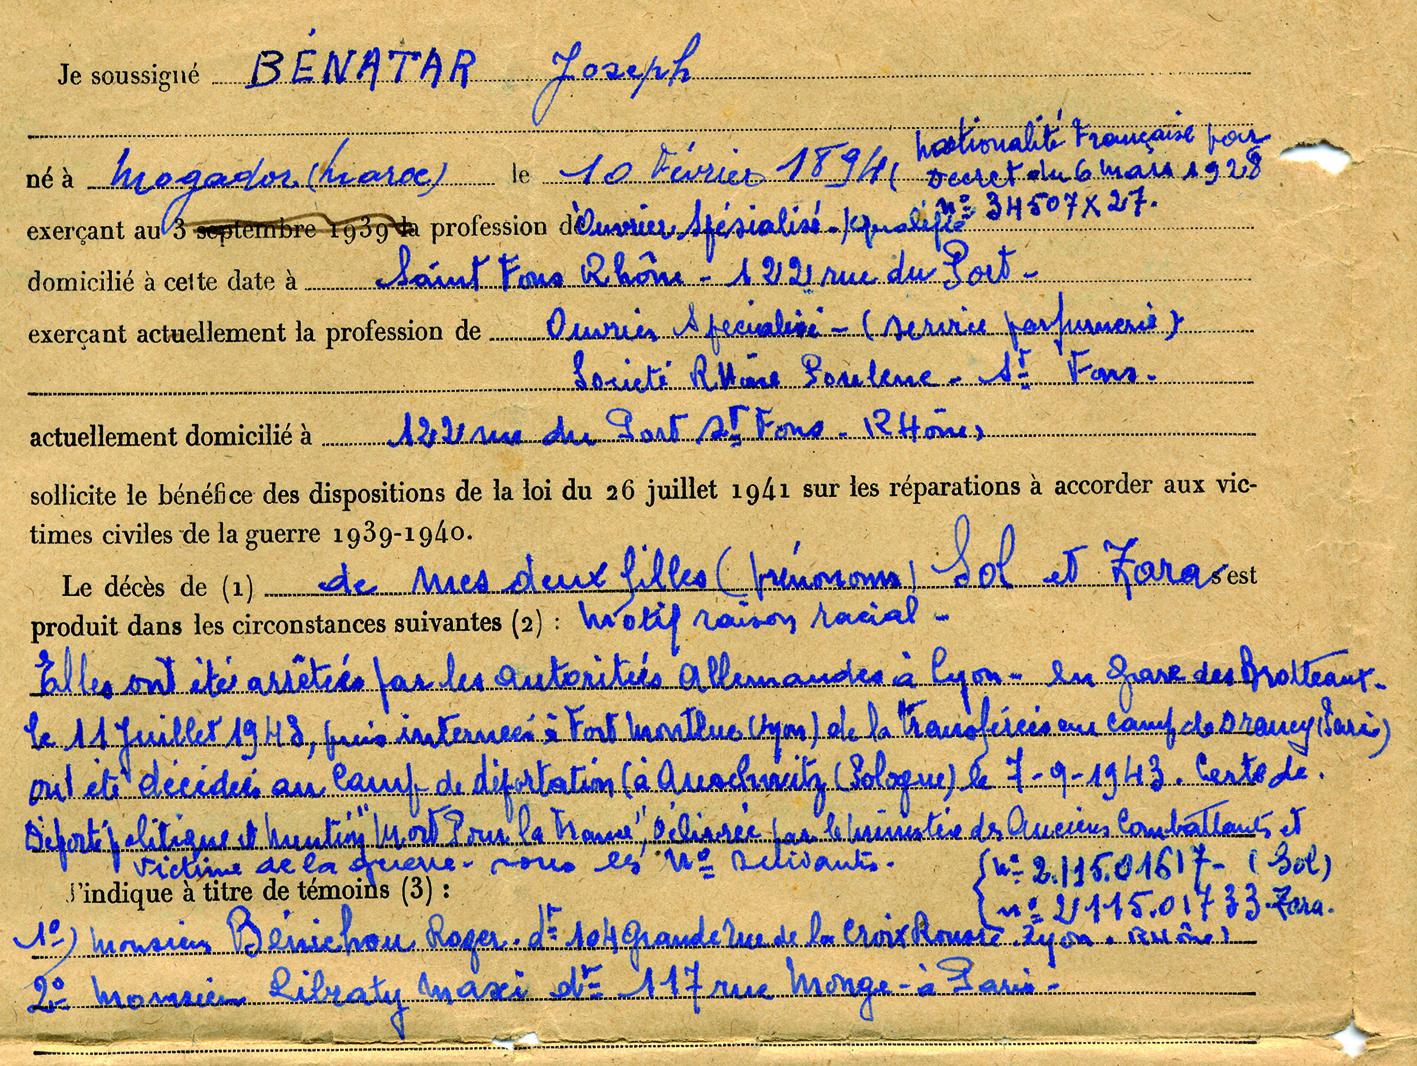 Benatar109 (Document officiel)